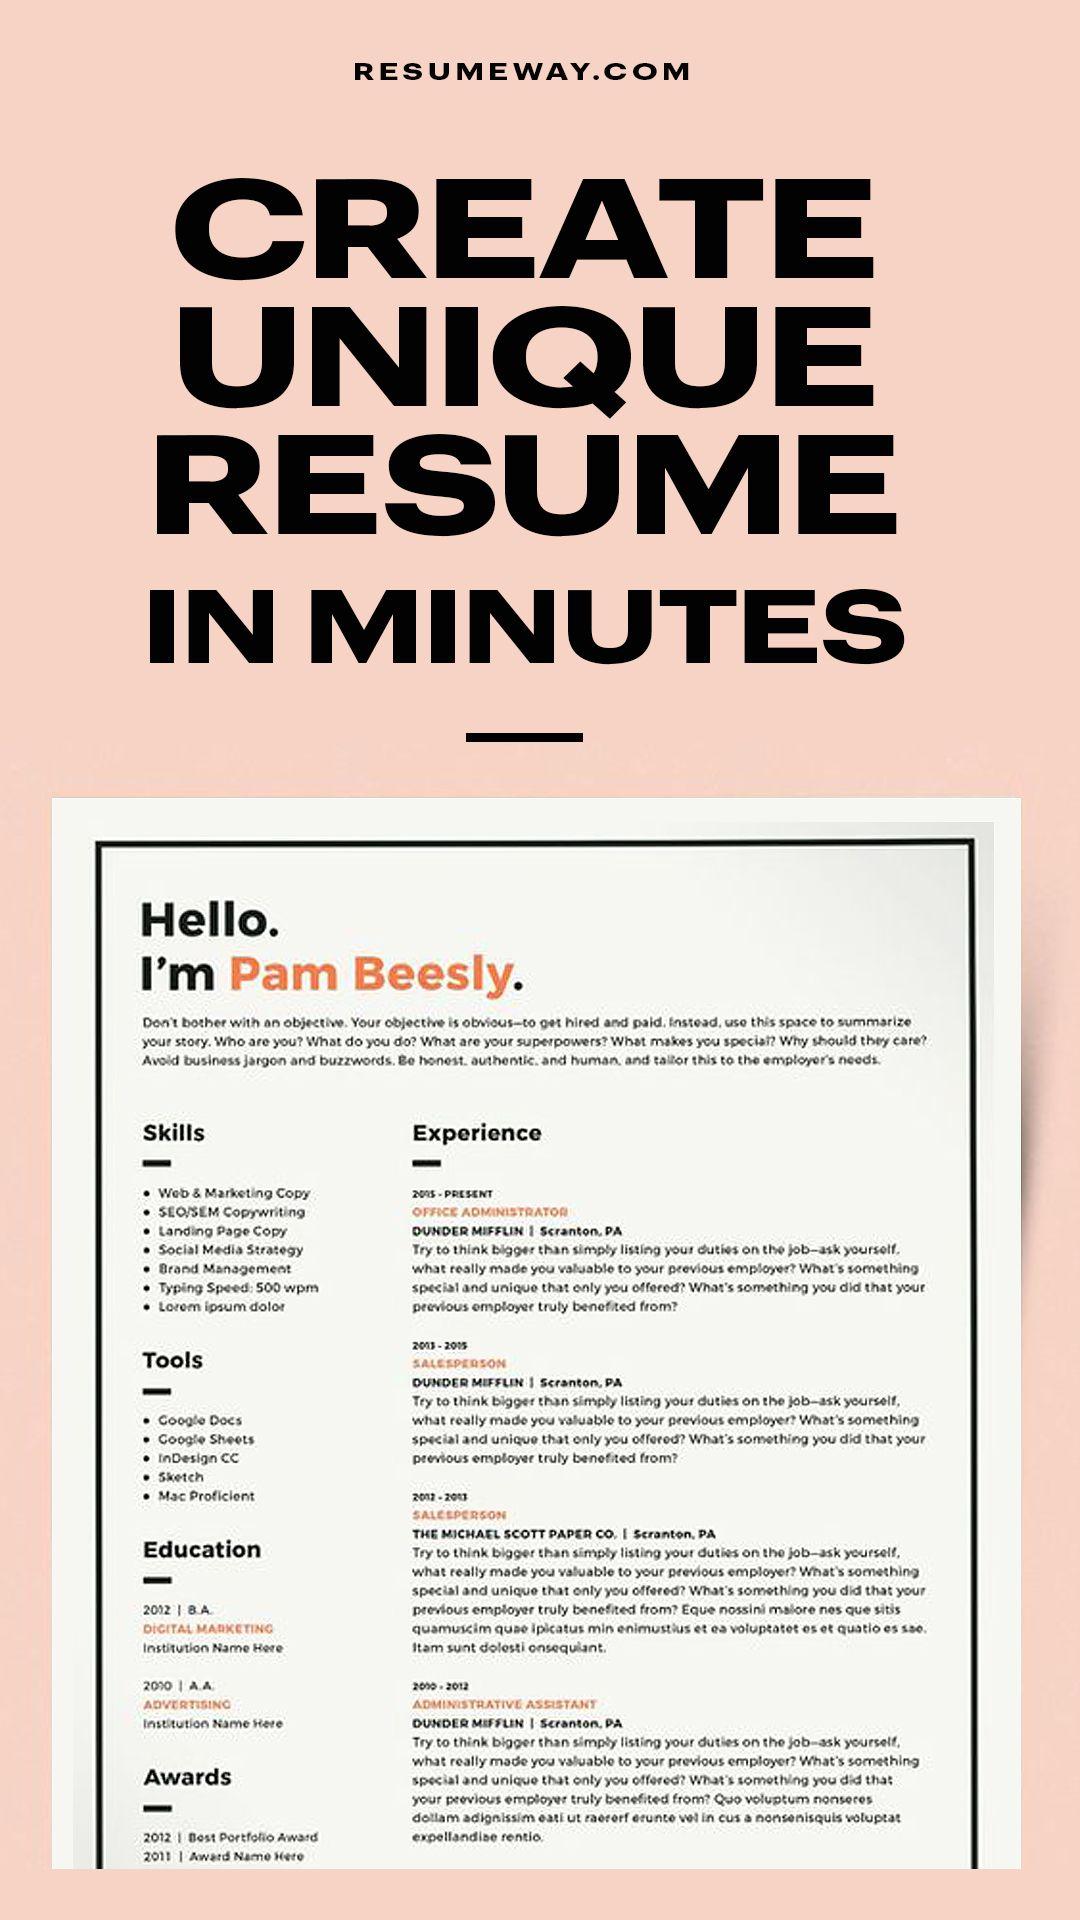 Classic Resume Template 120410 (color orange) Resumeway